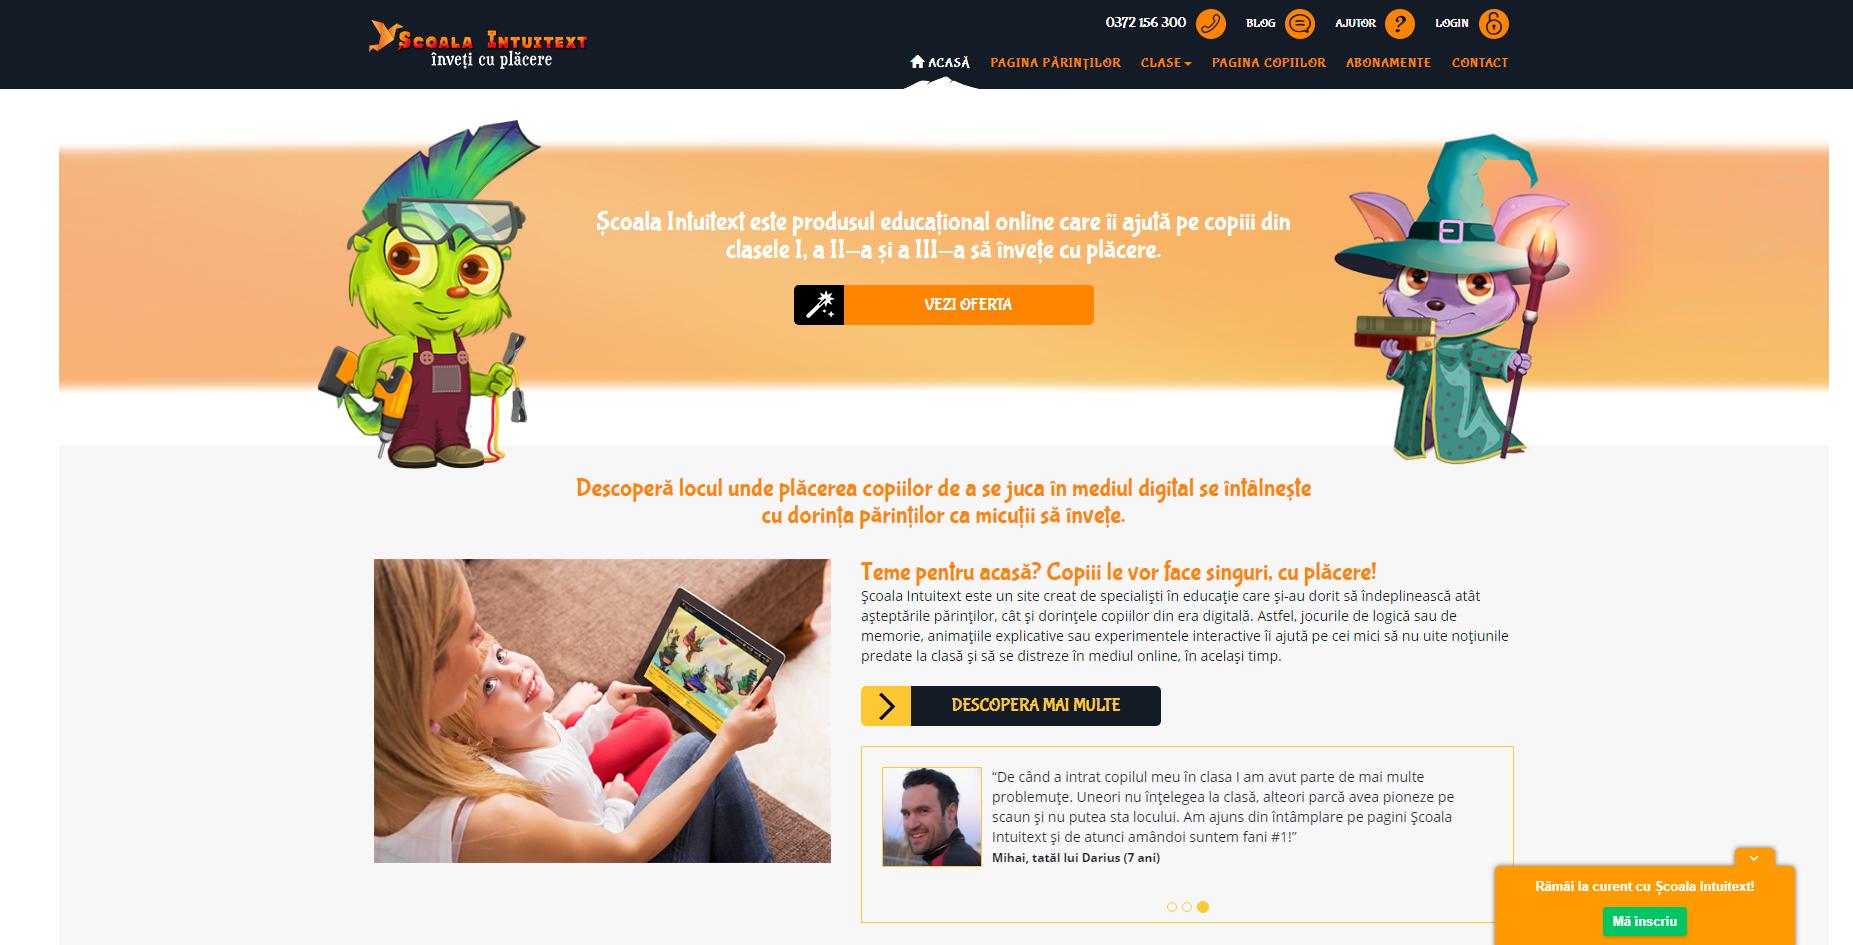 Site-ul educațional Școala Intuitext